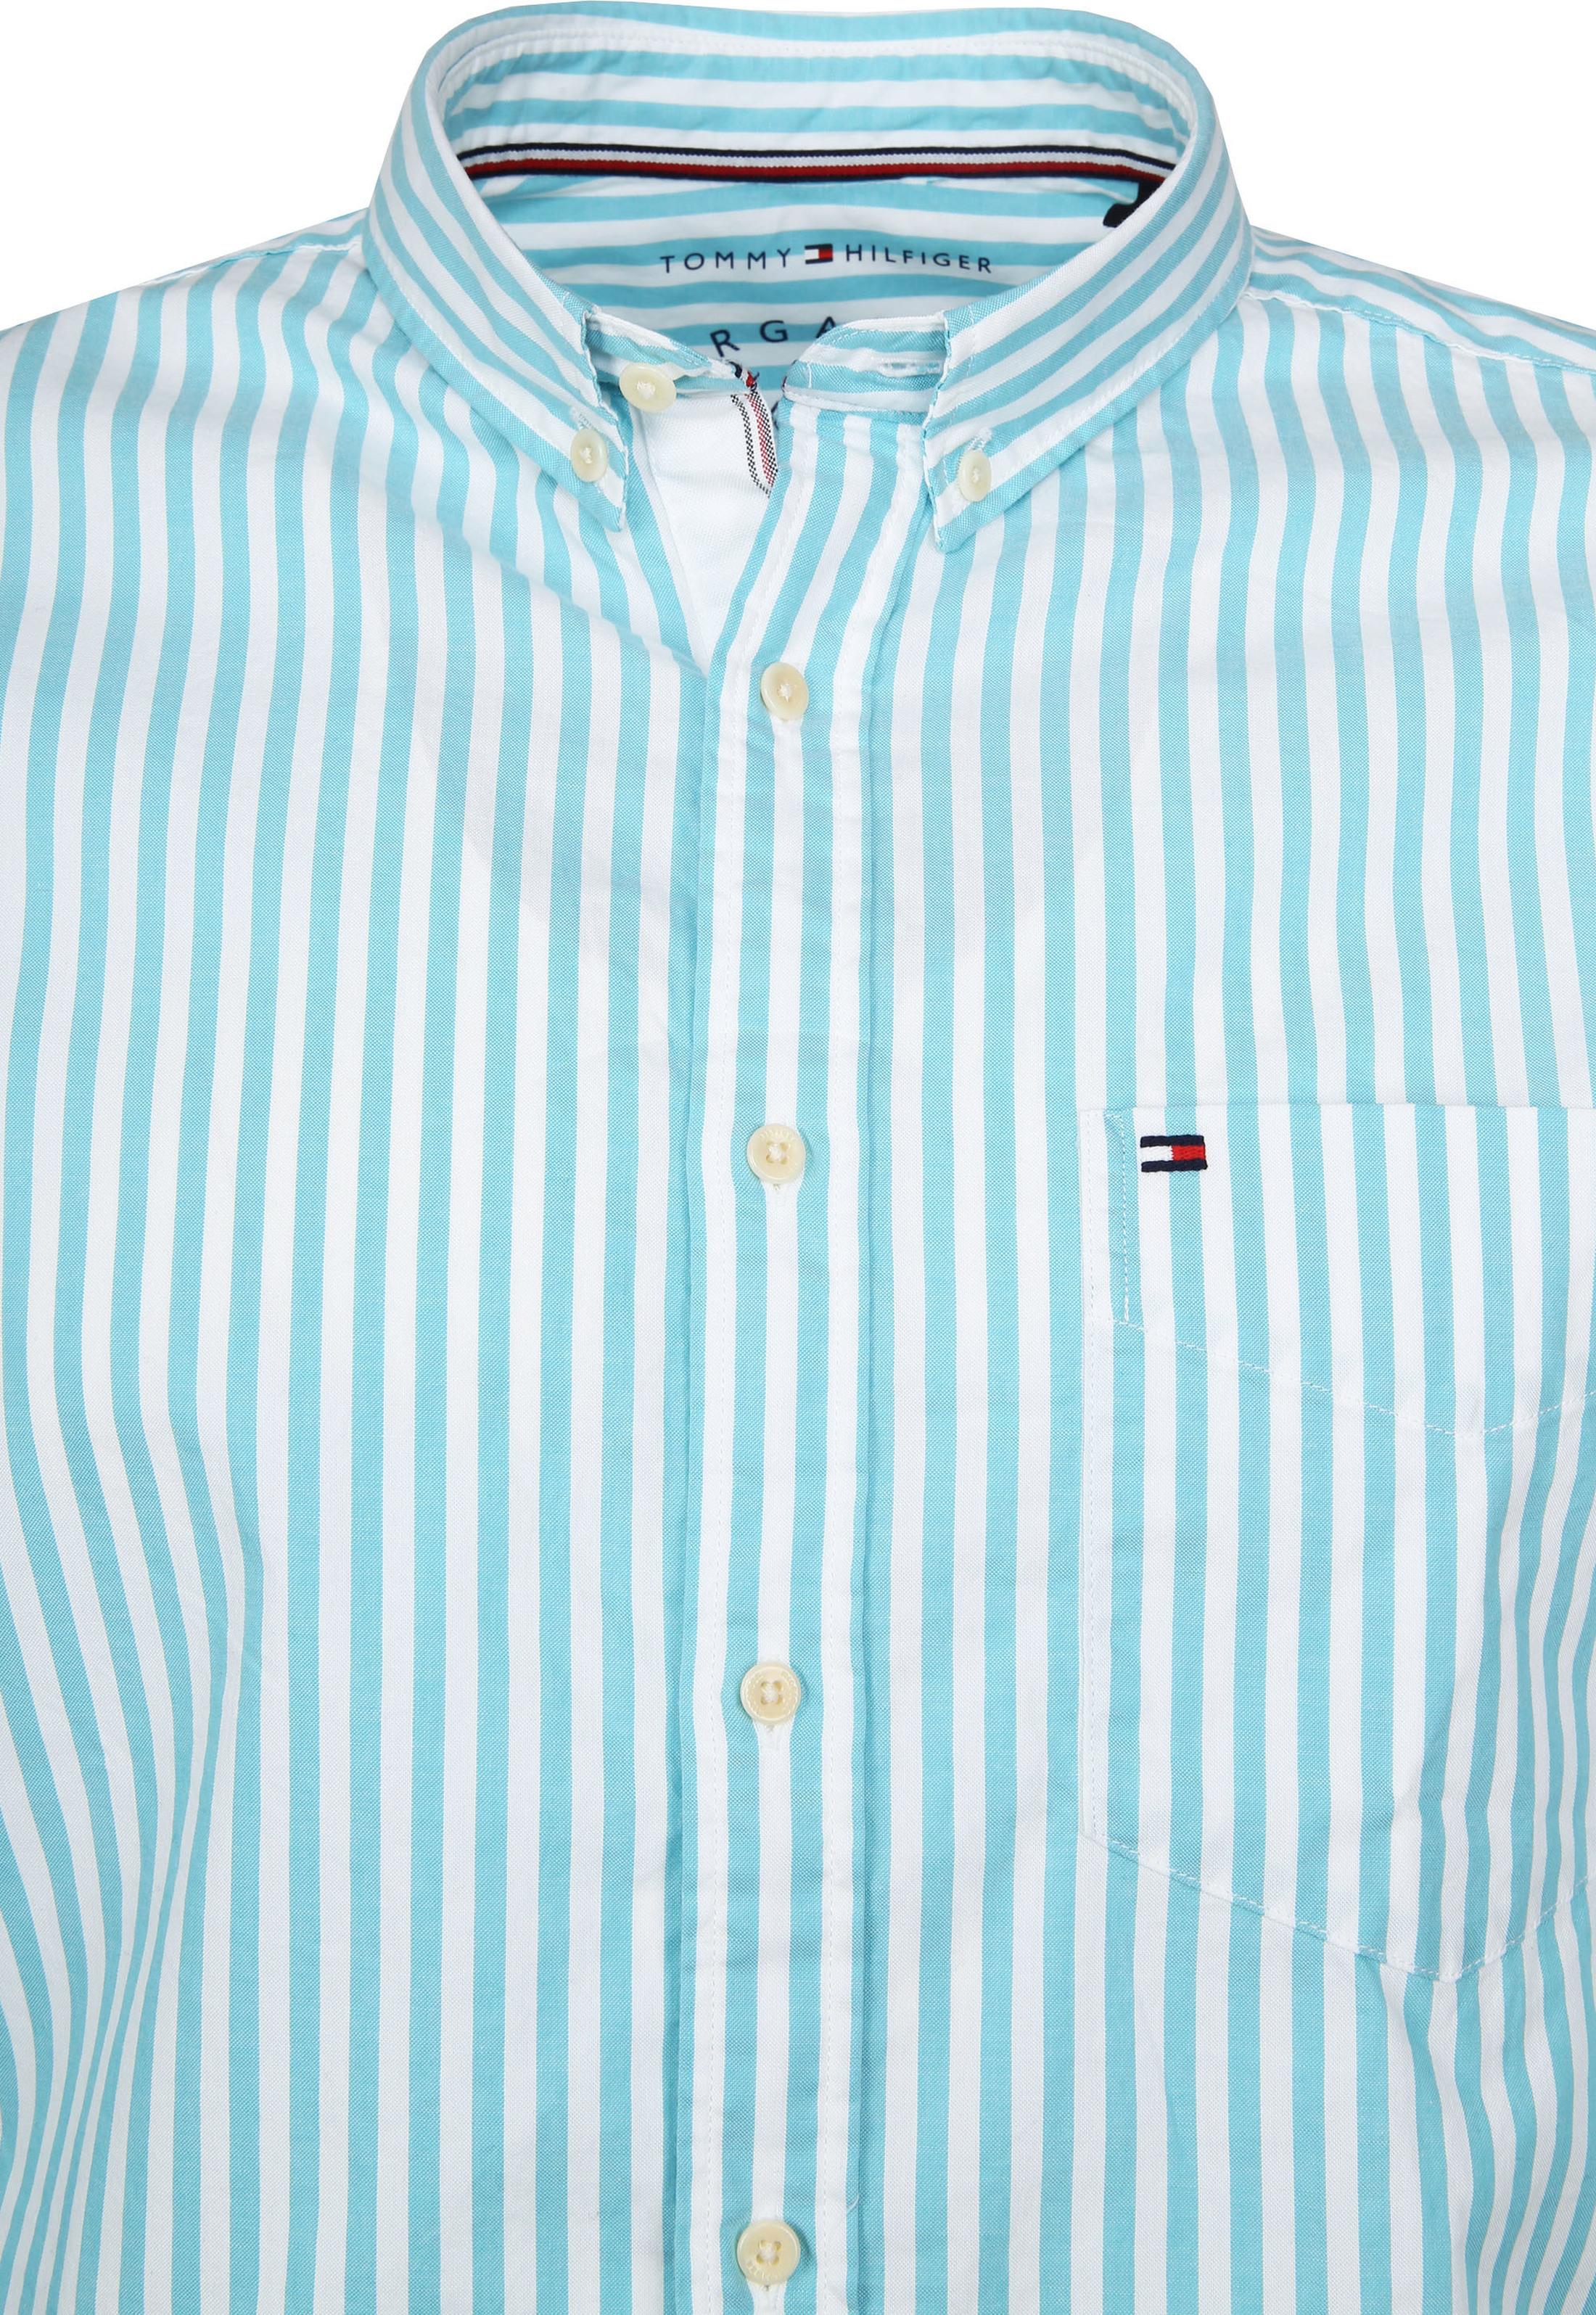 Tommy Hilfiger Oxford Strepen Overhemd foto 2